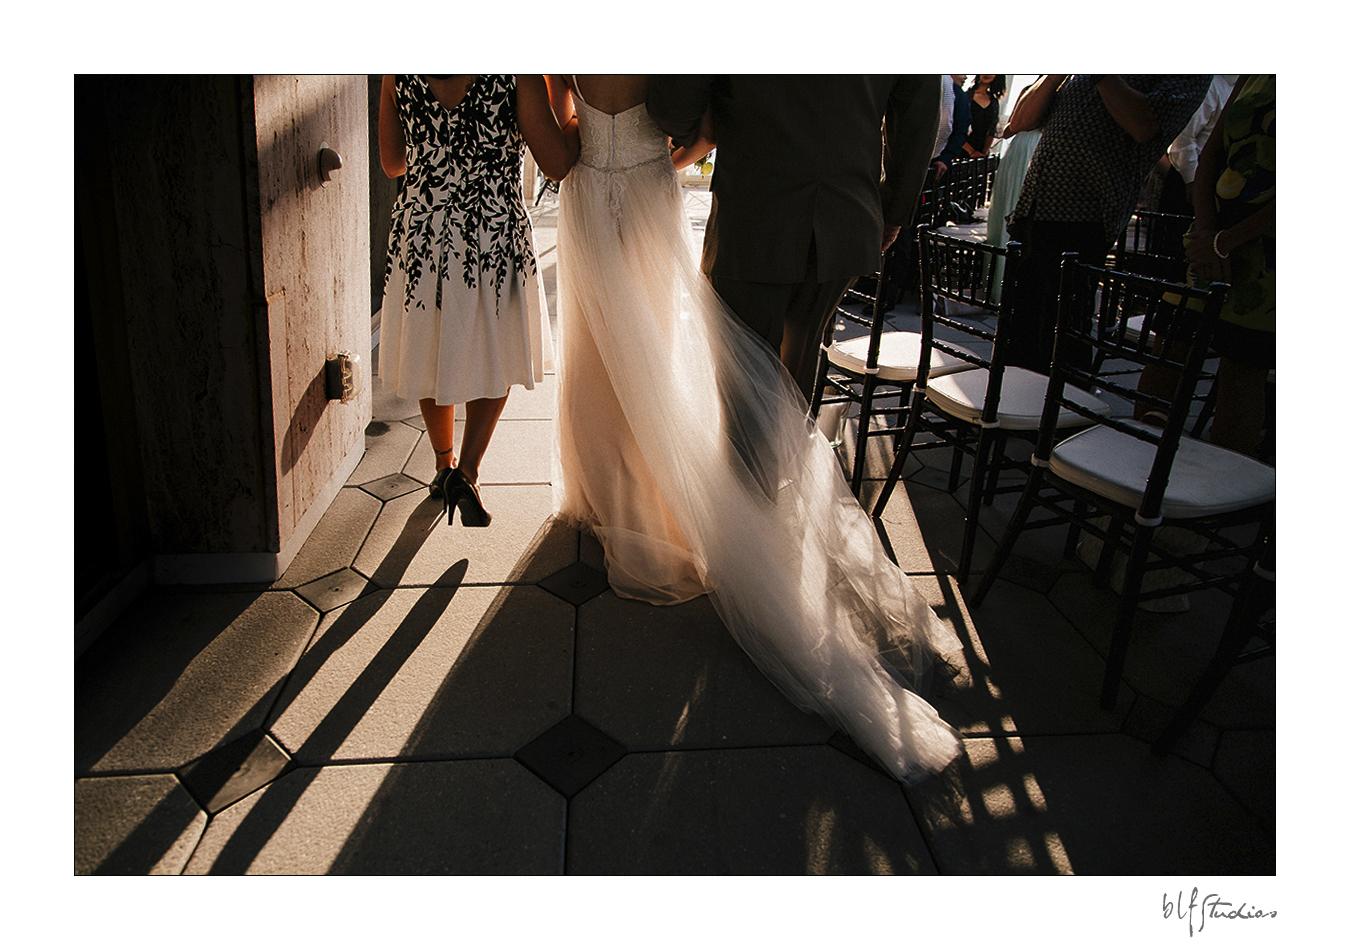 0016-blfstudios-wedding-photographer-daniel-danielle-atlanta.jpg